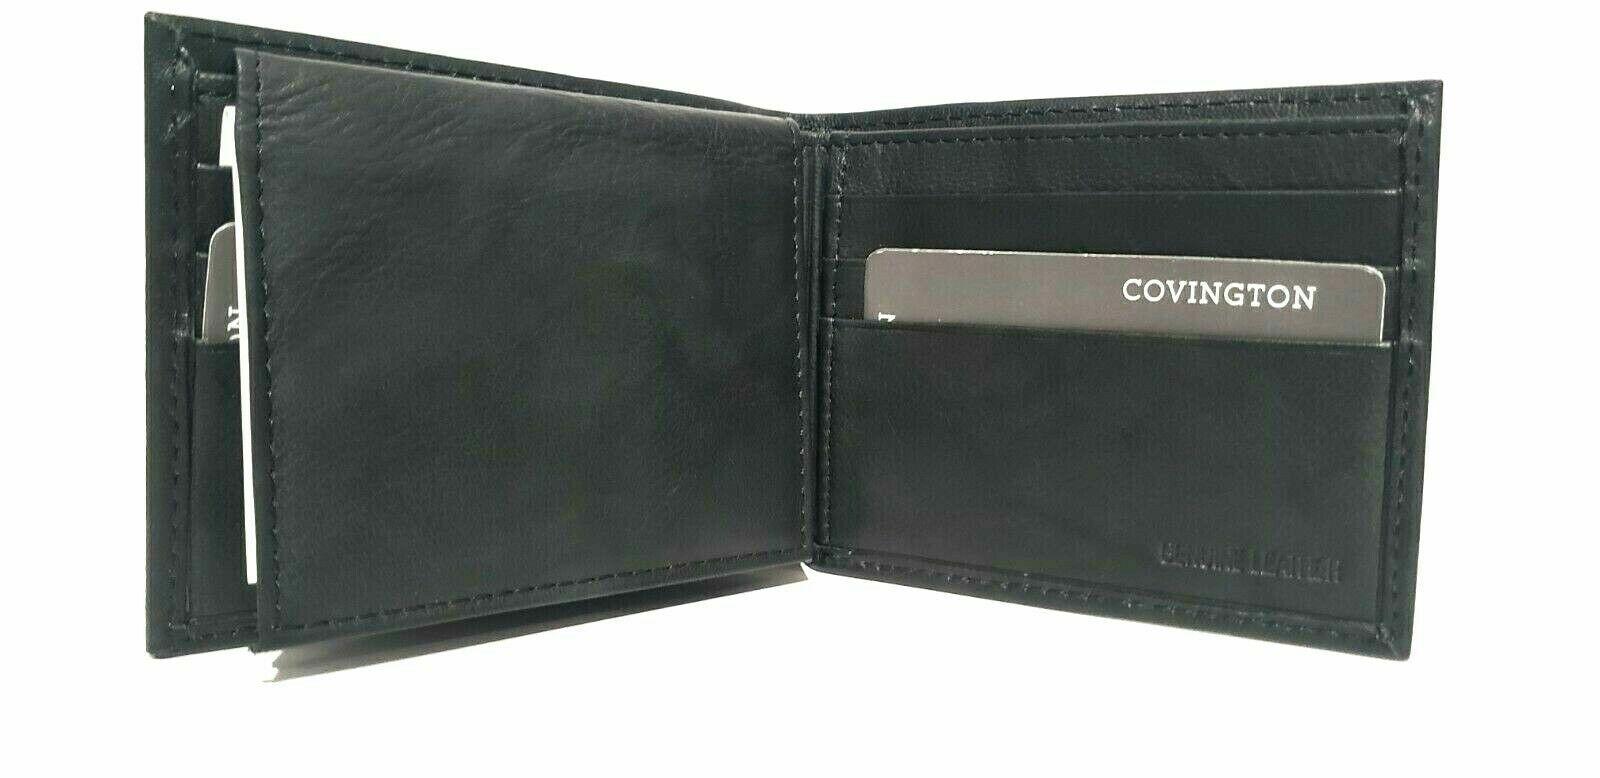 Men's Wallet, Buxton Men's Credit Card CC Billfold Wallet, Genuine Leather Black